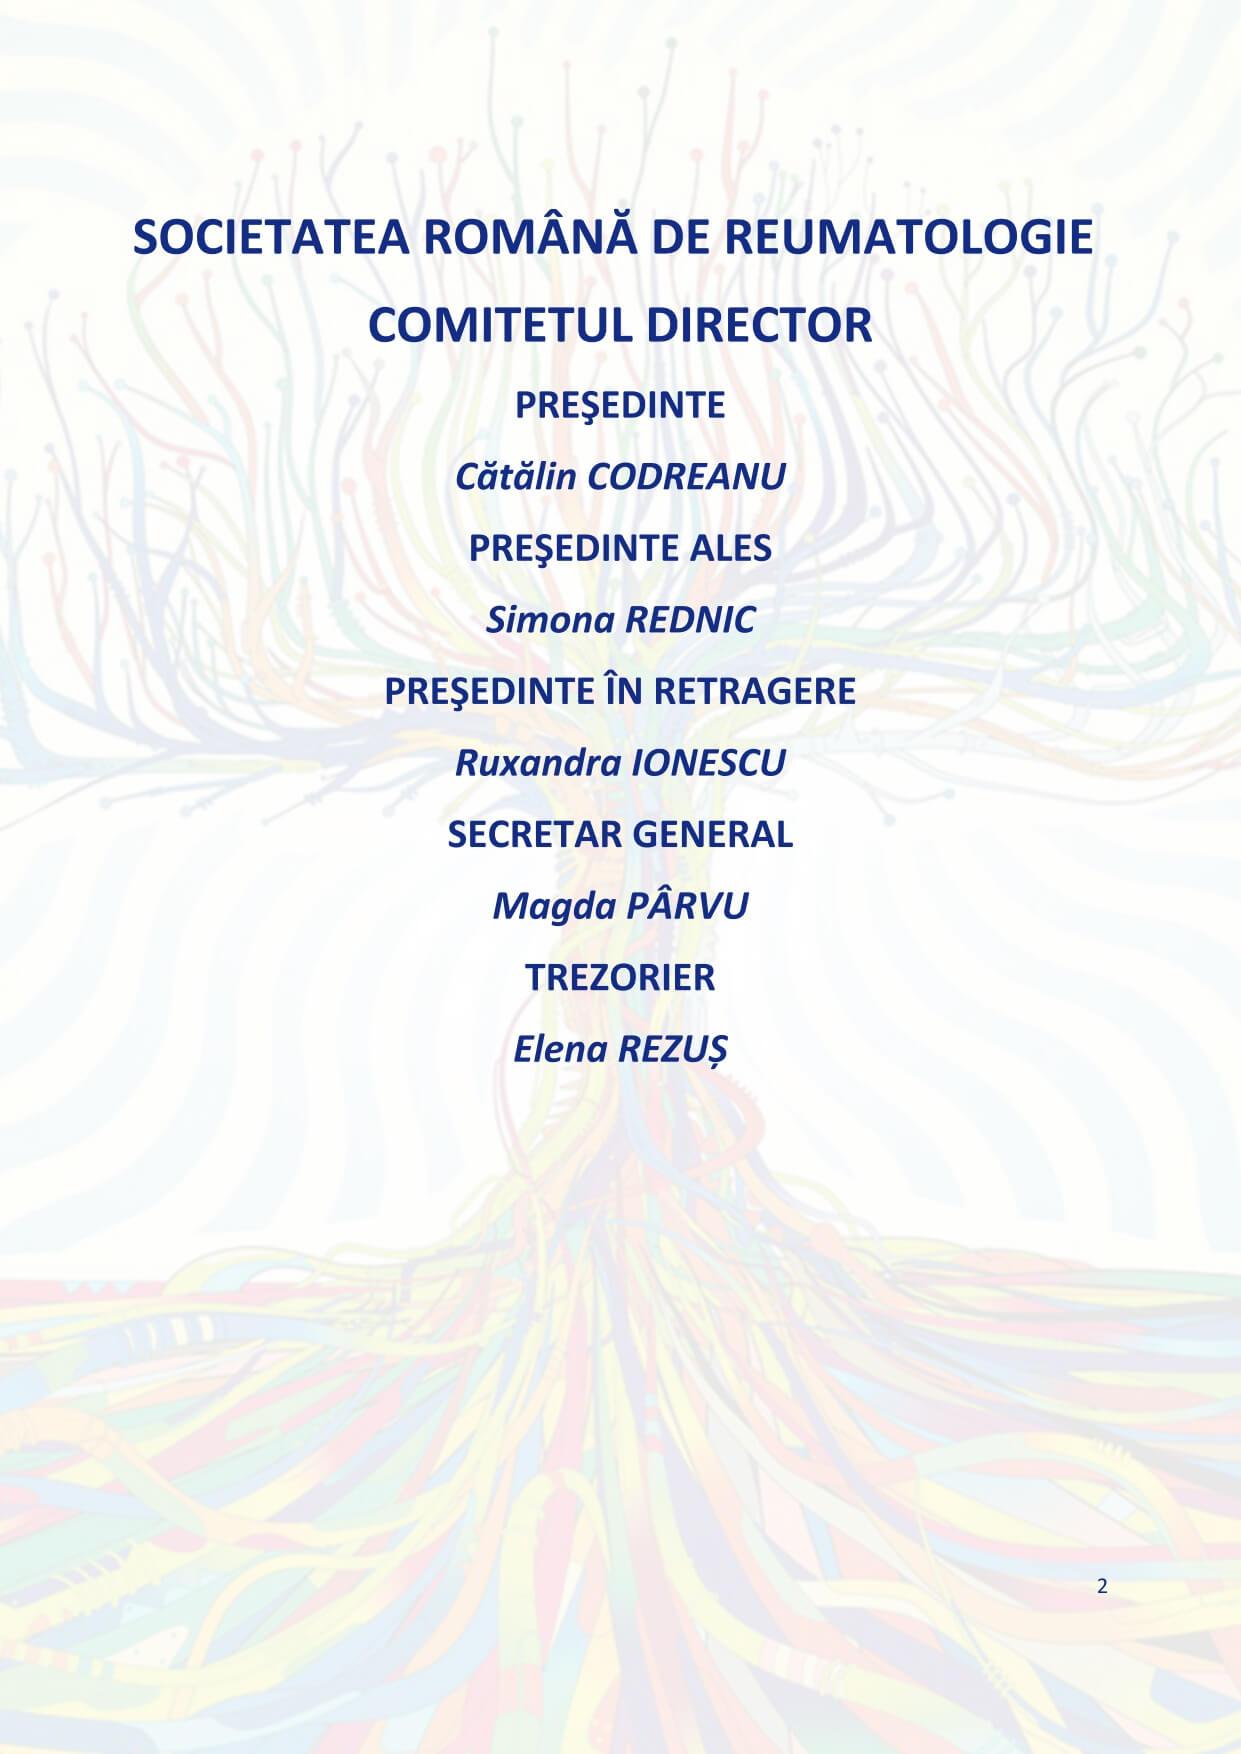 Program_CNR_2019_final__23,09,19_________________page-0002